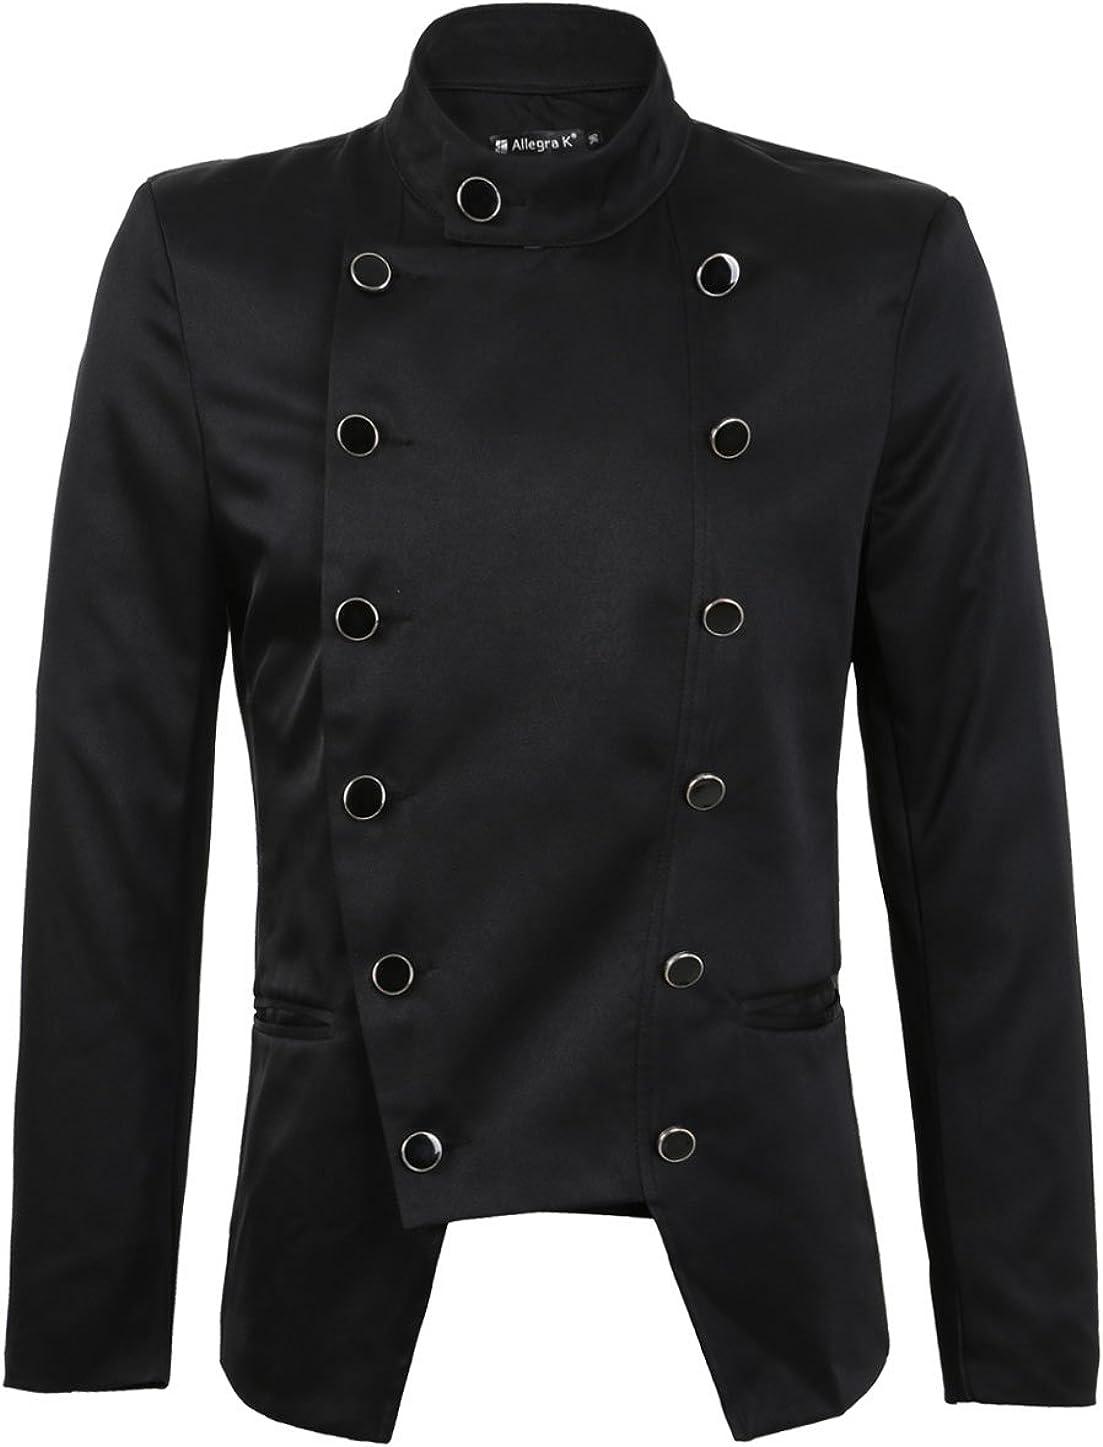 uxcell Men Casual Slim Fit Pocket Irregular Double Breasted Suit Jacket Blazer